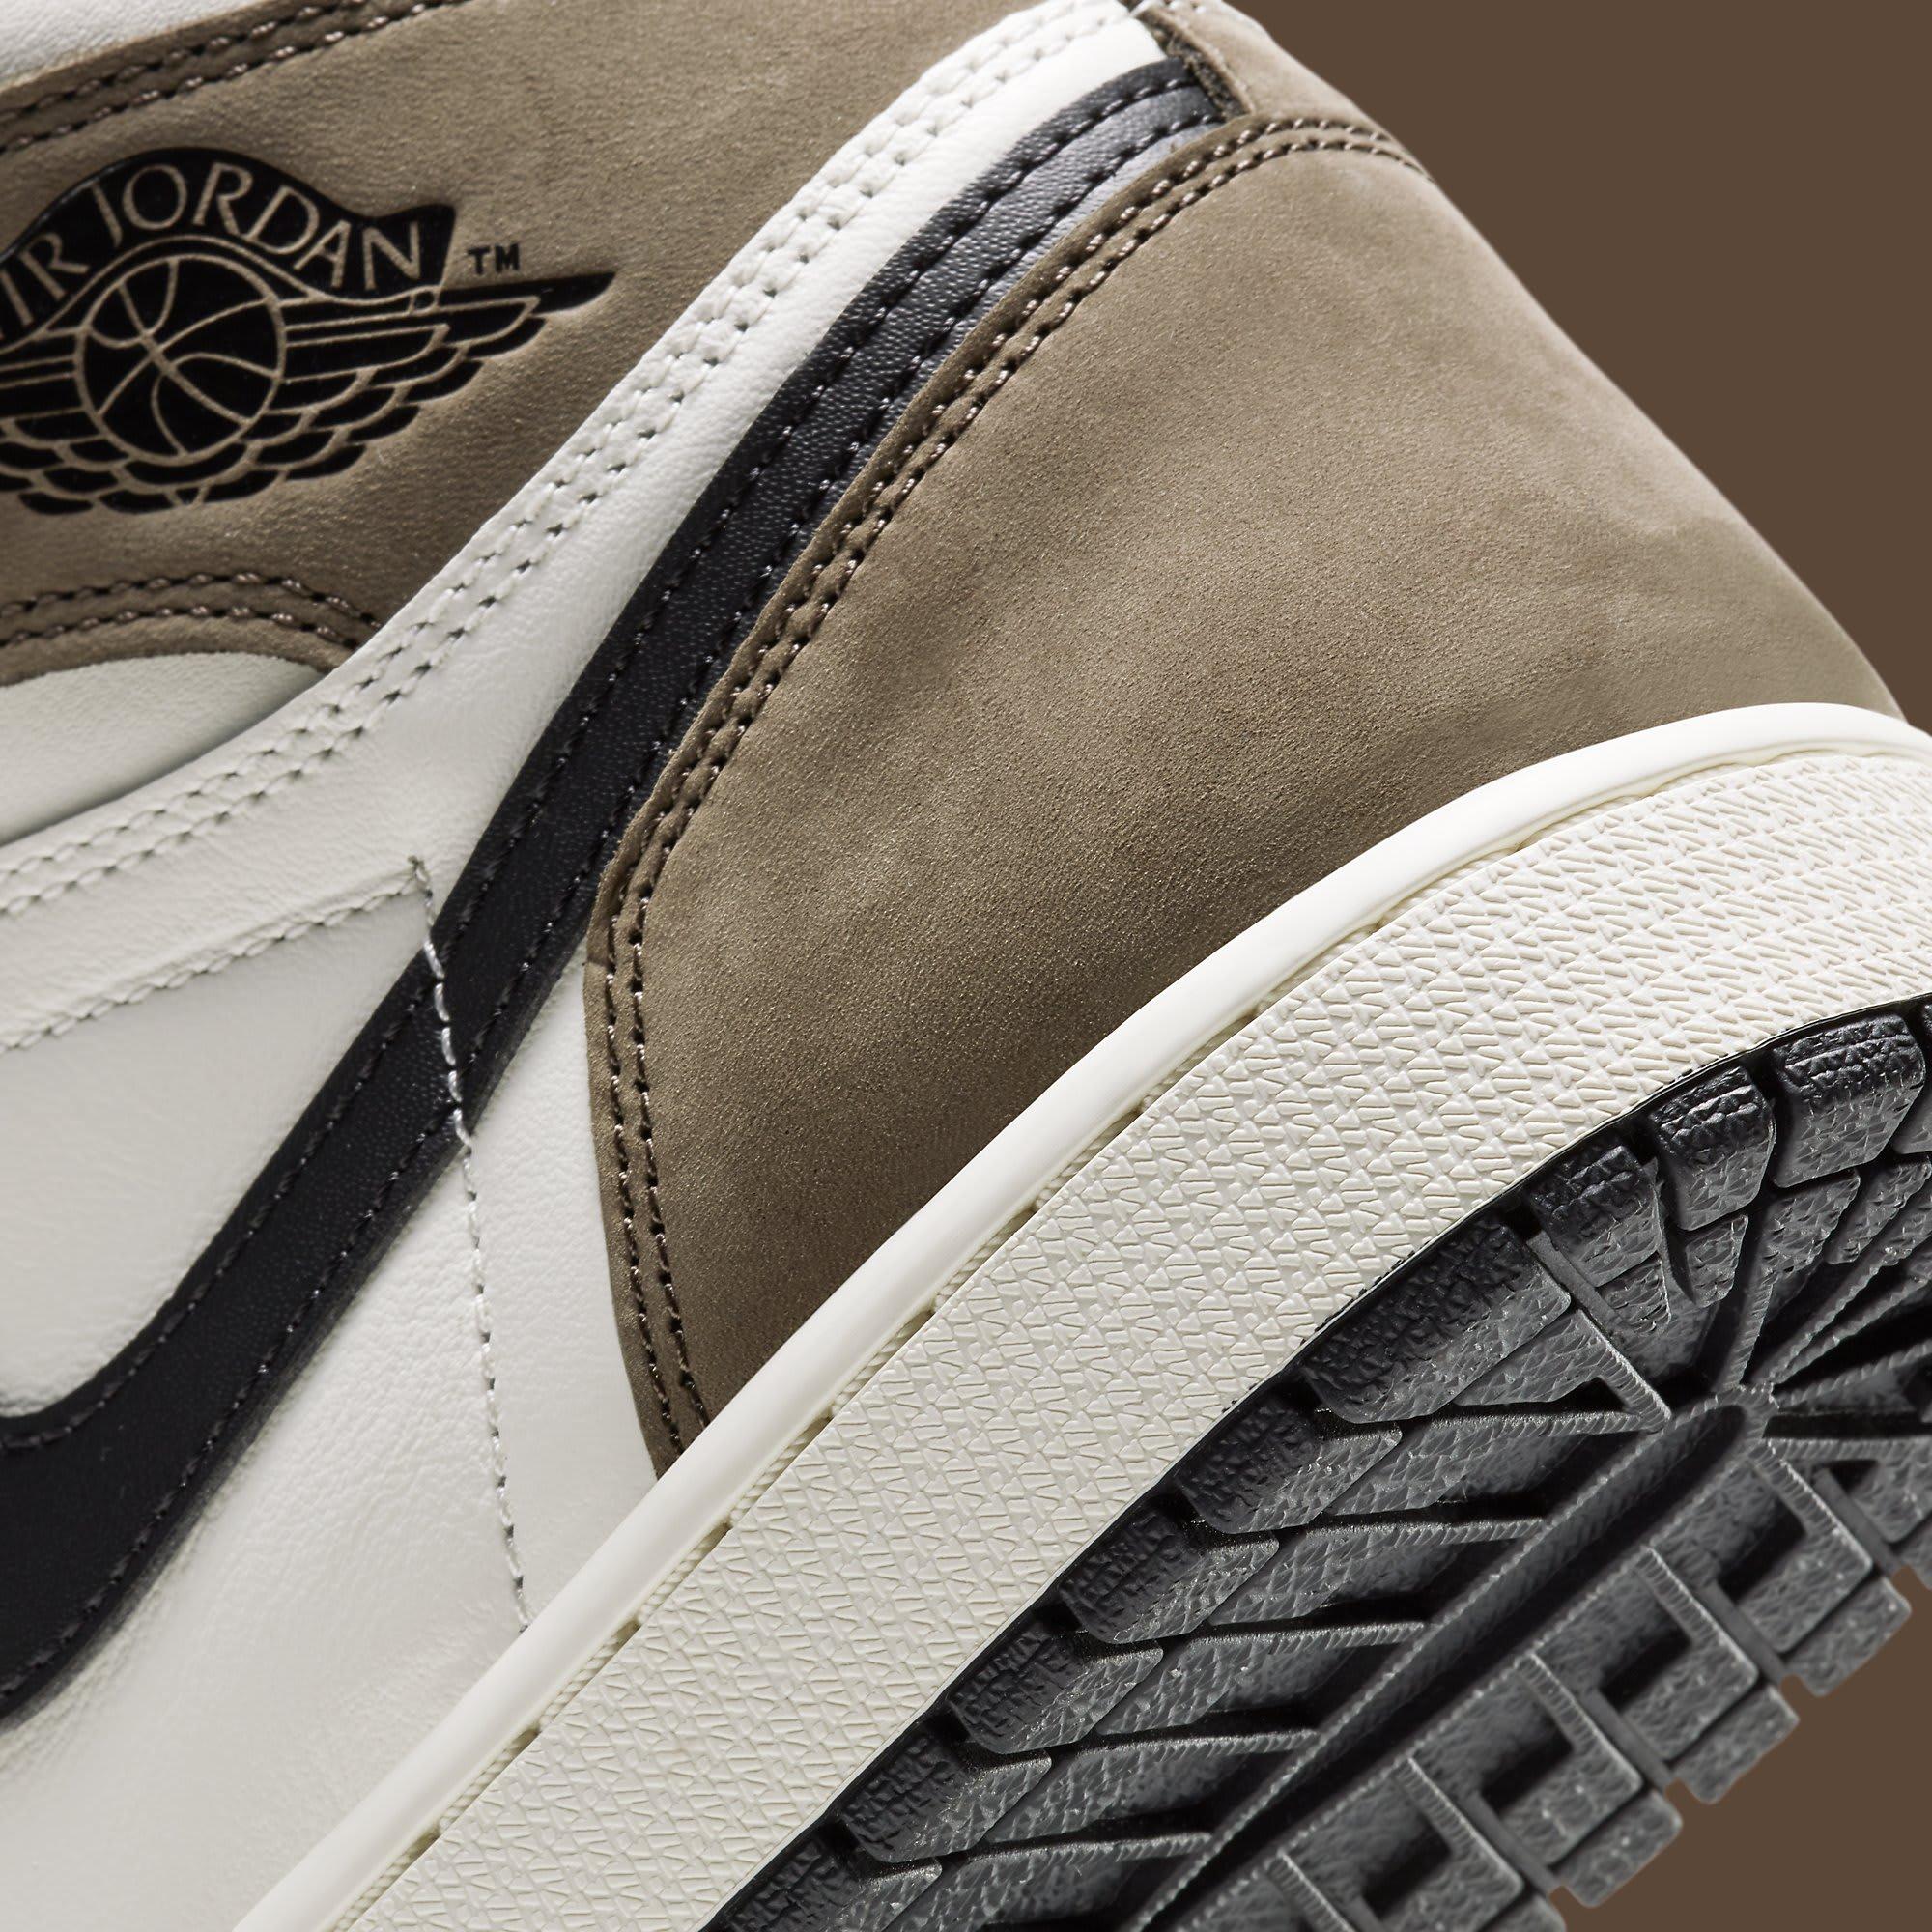 Air Jordan 1 Dark Mocha Release Date 555088-105 Heel Detail